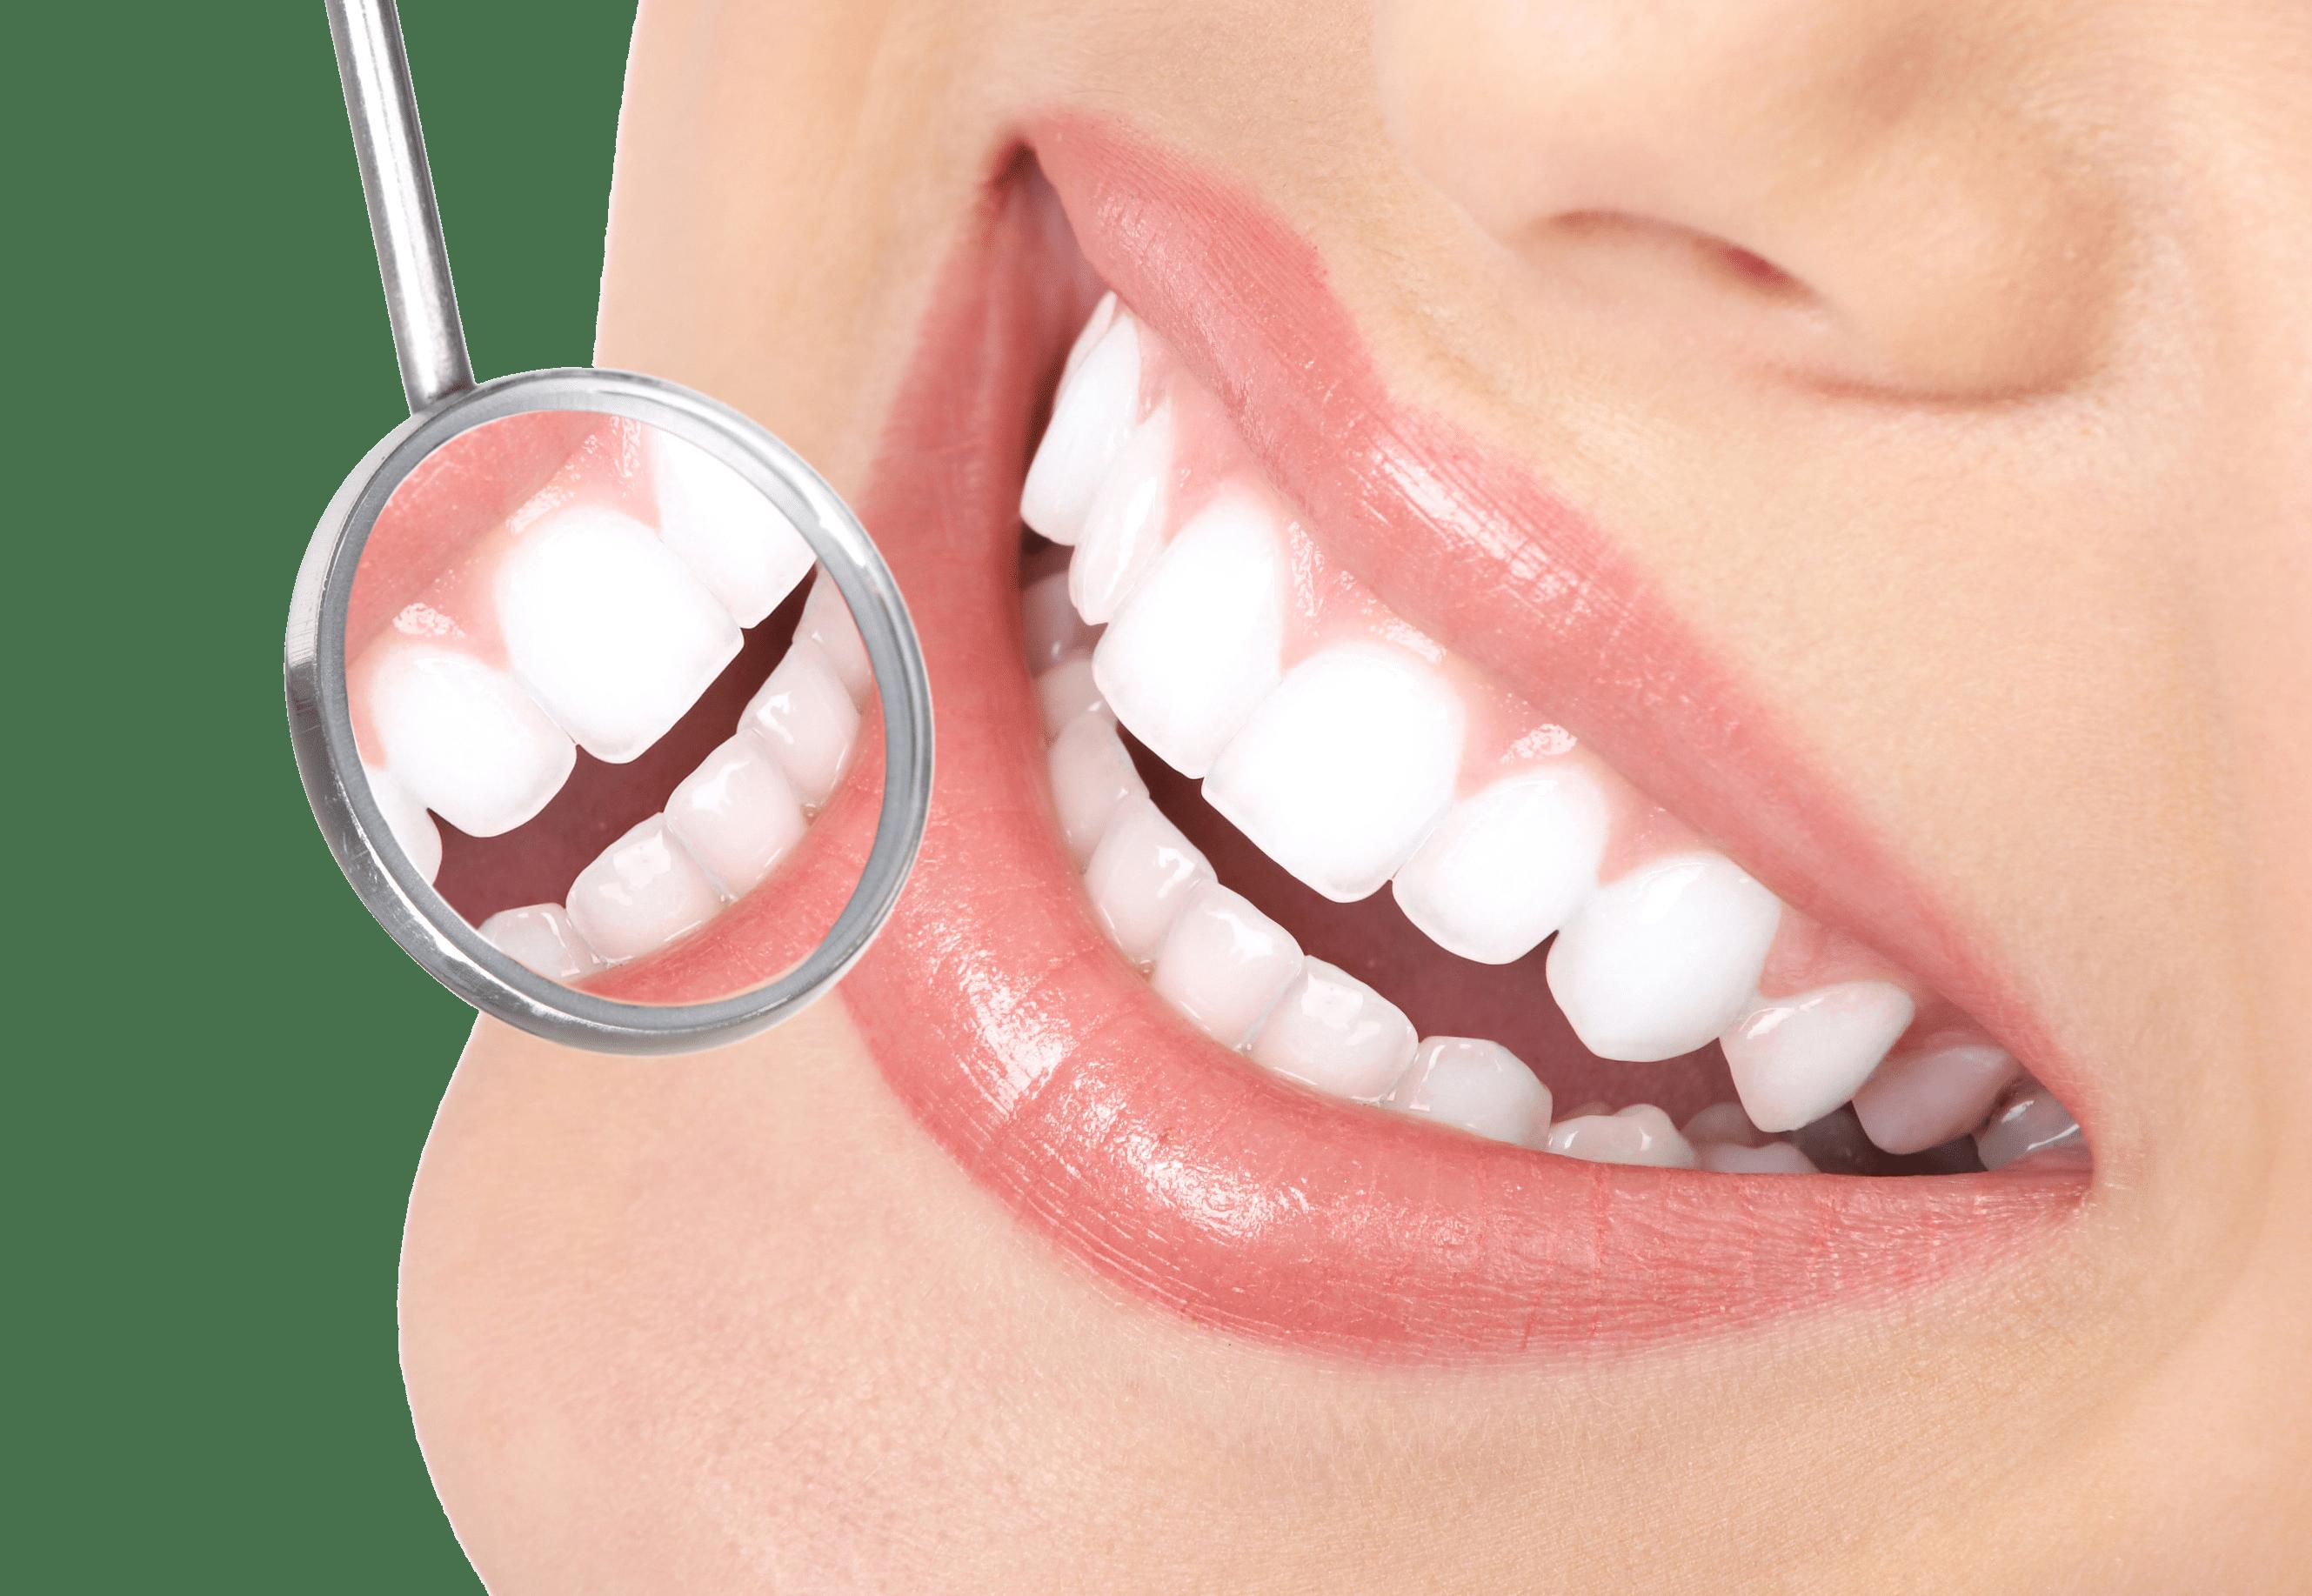 Advantages of Restorative Dentistry in Southwest Florida